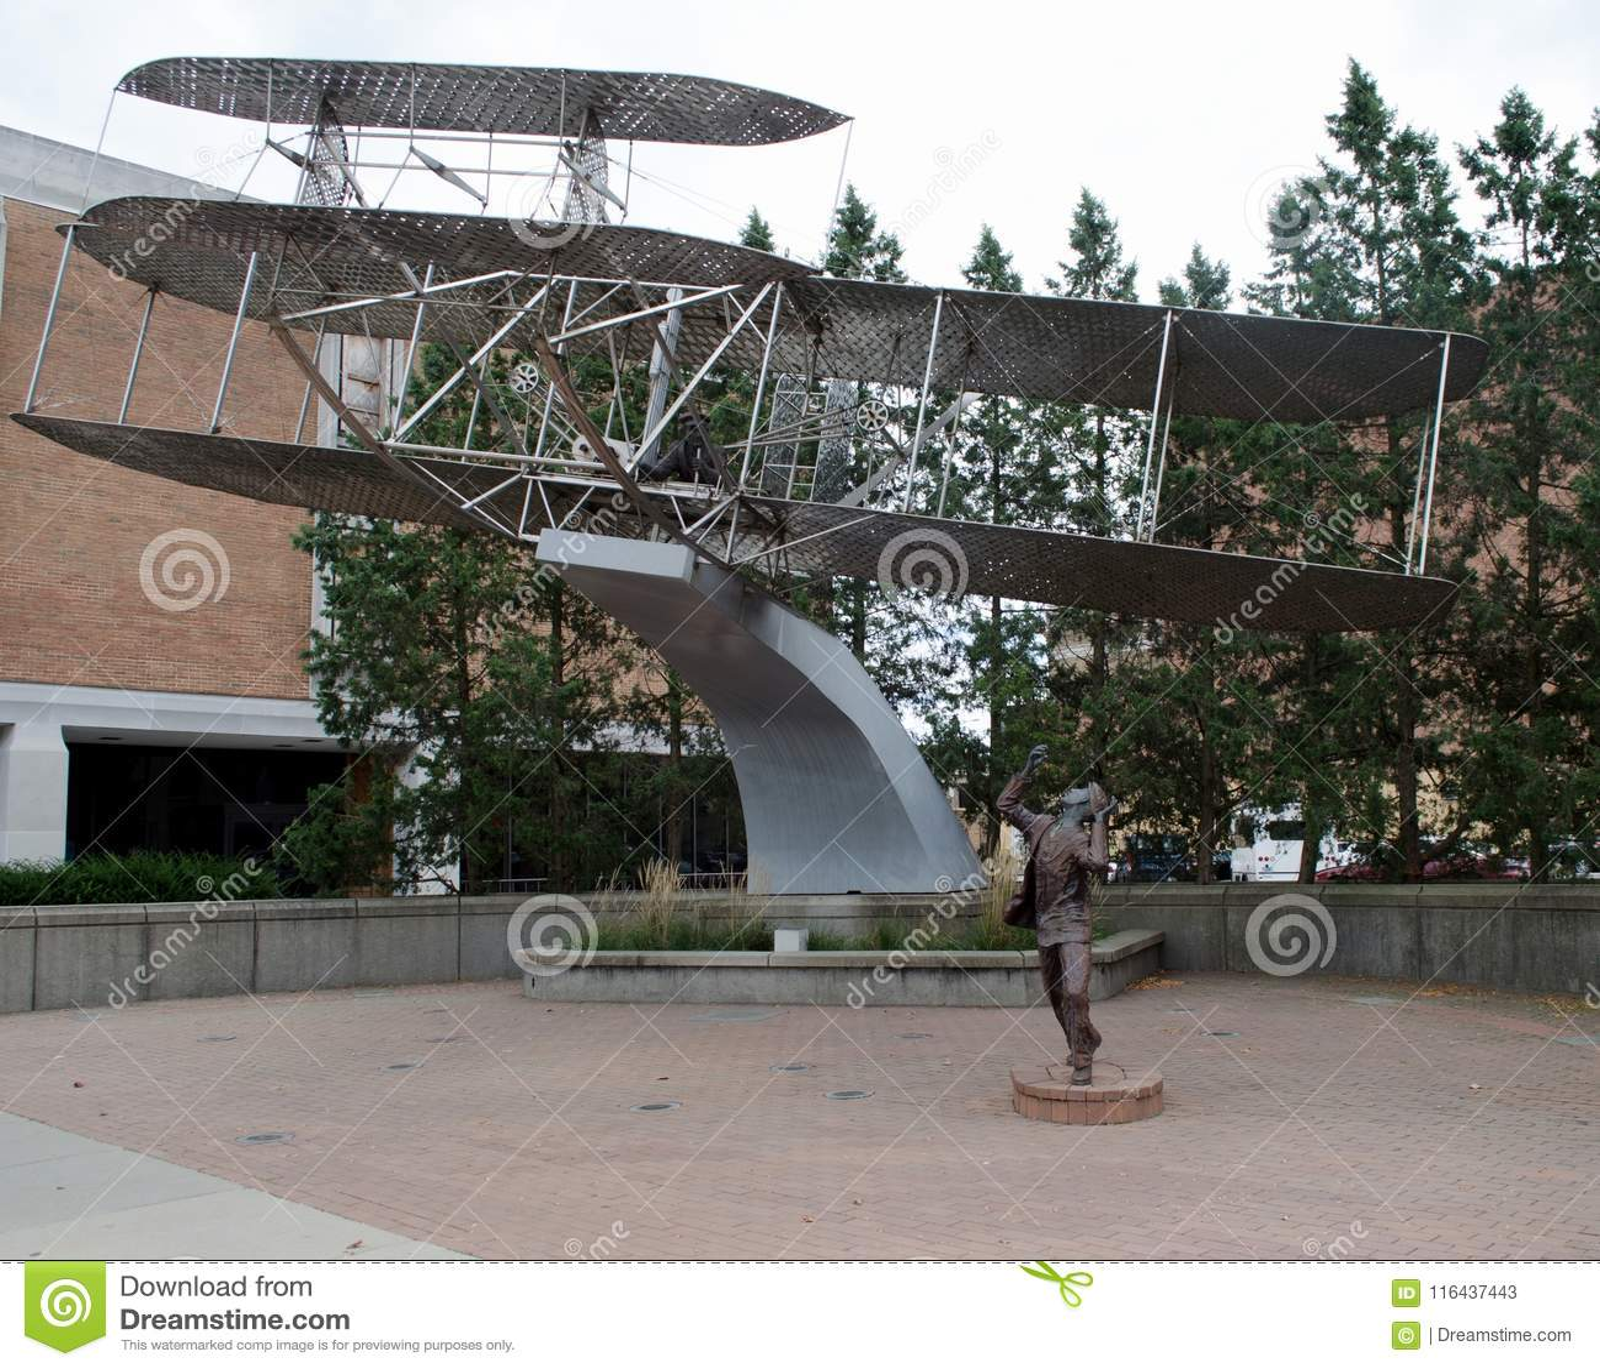 Wright Brothers Biplane